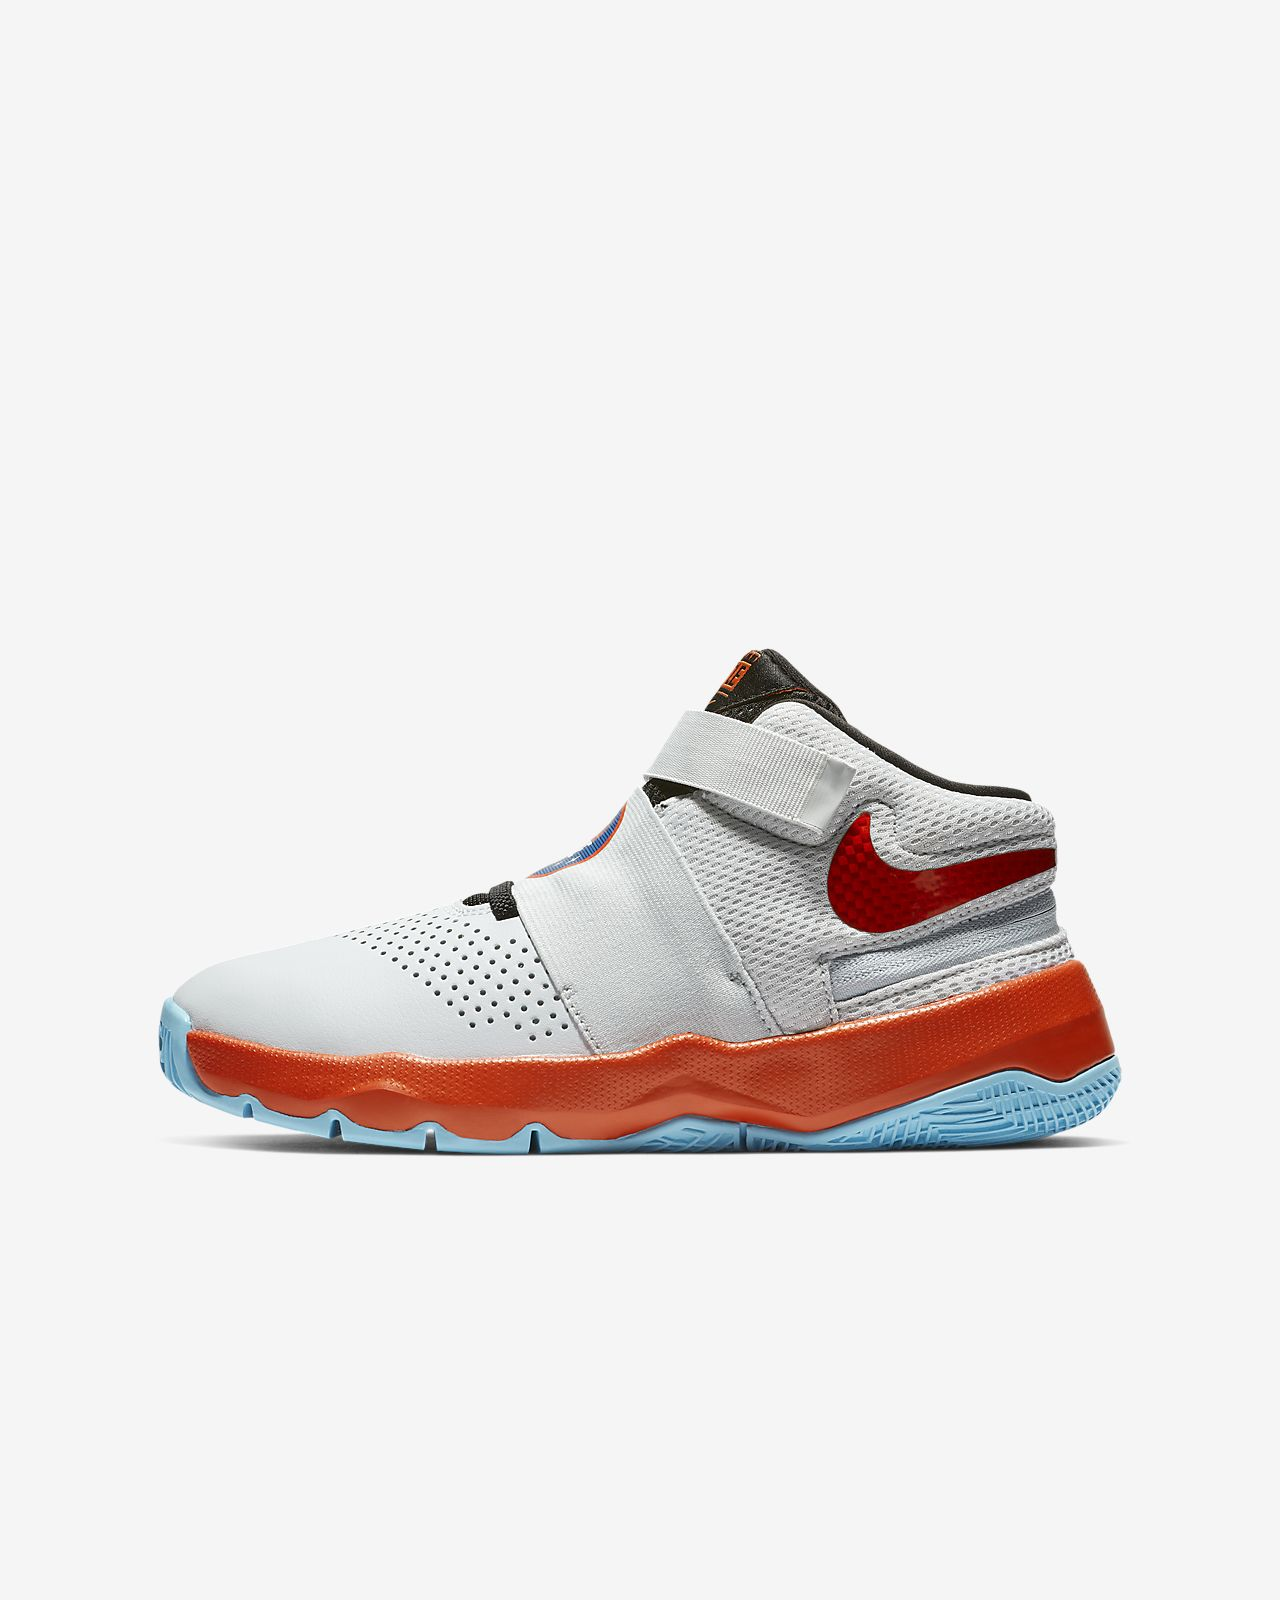 new concept 14f59 4b3d4 ... Nike Team Hustle D 8 FlyEase Basketballschuh für ältere Kinder